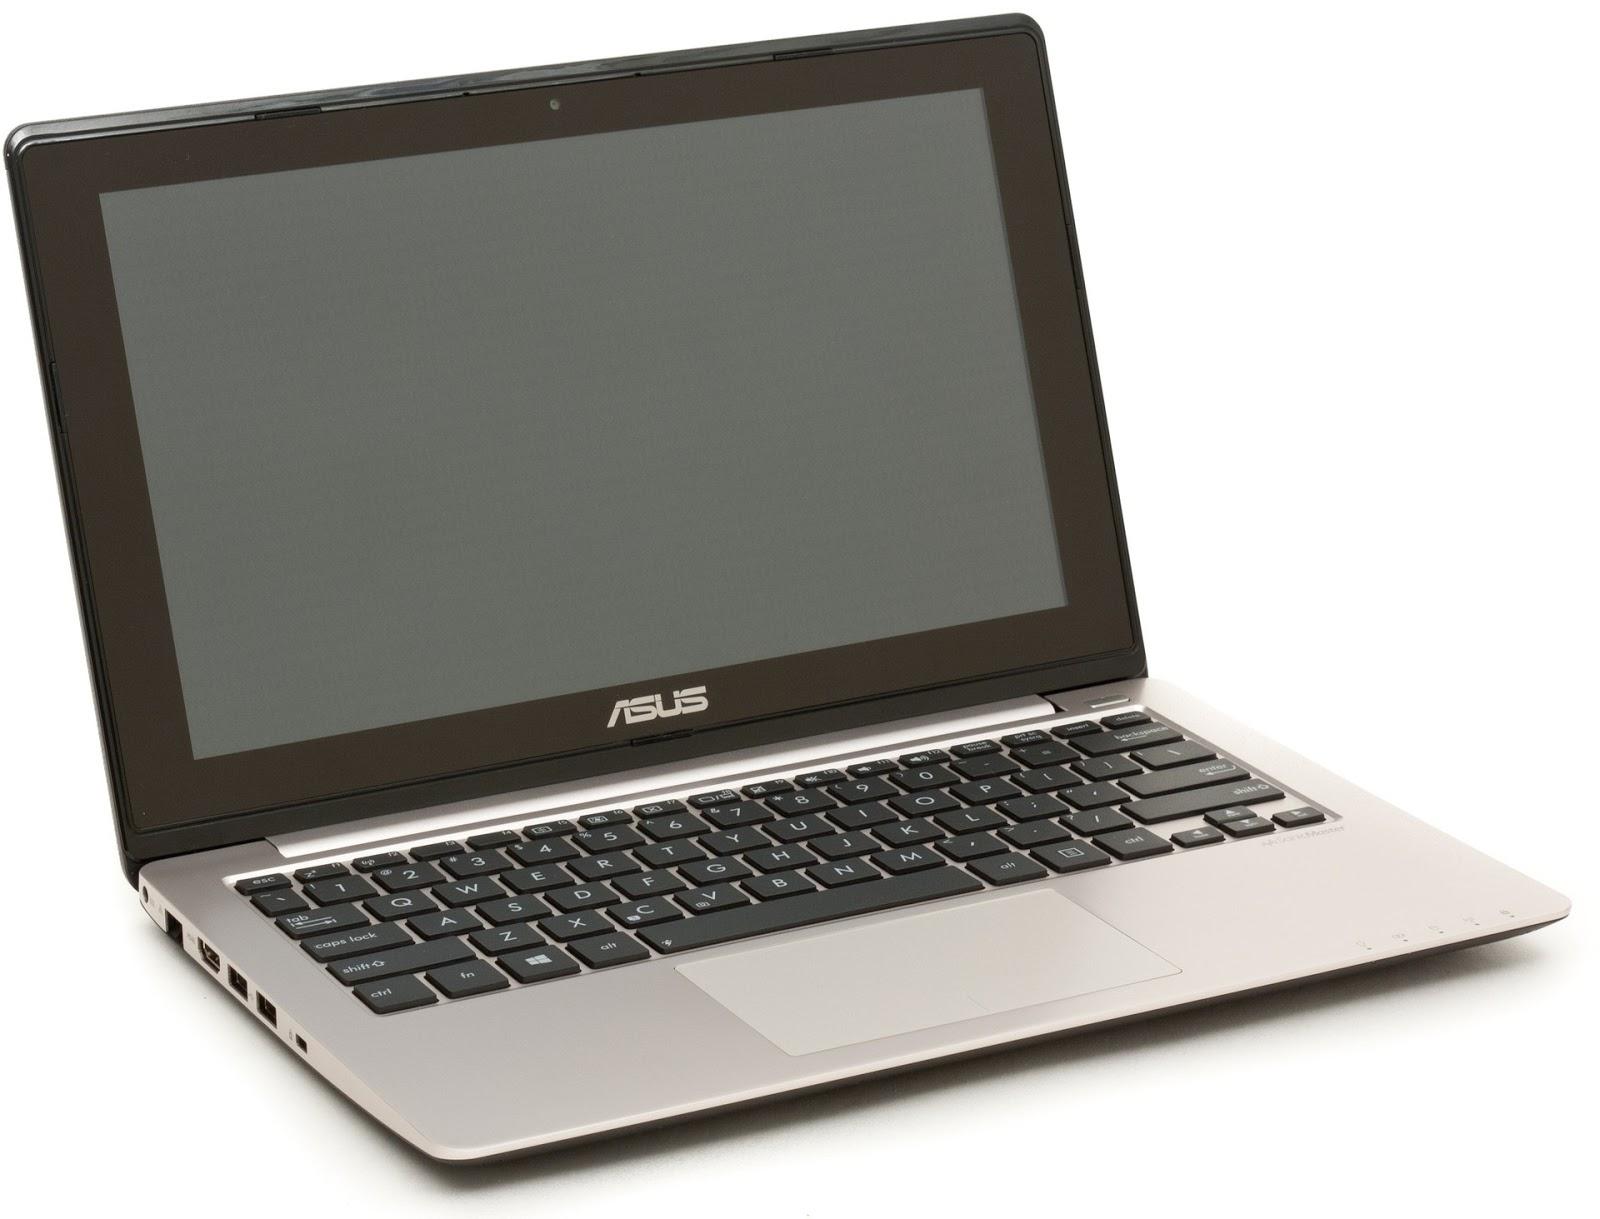 Gambar Laptop Asus 2013 Icefilmsinfo Globolister Harga Notebook 2013 Asus Di Malaysia Car Interior Design